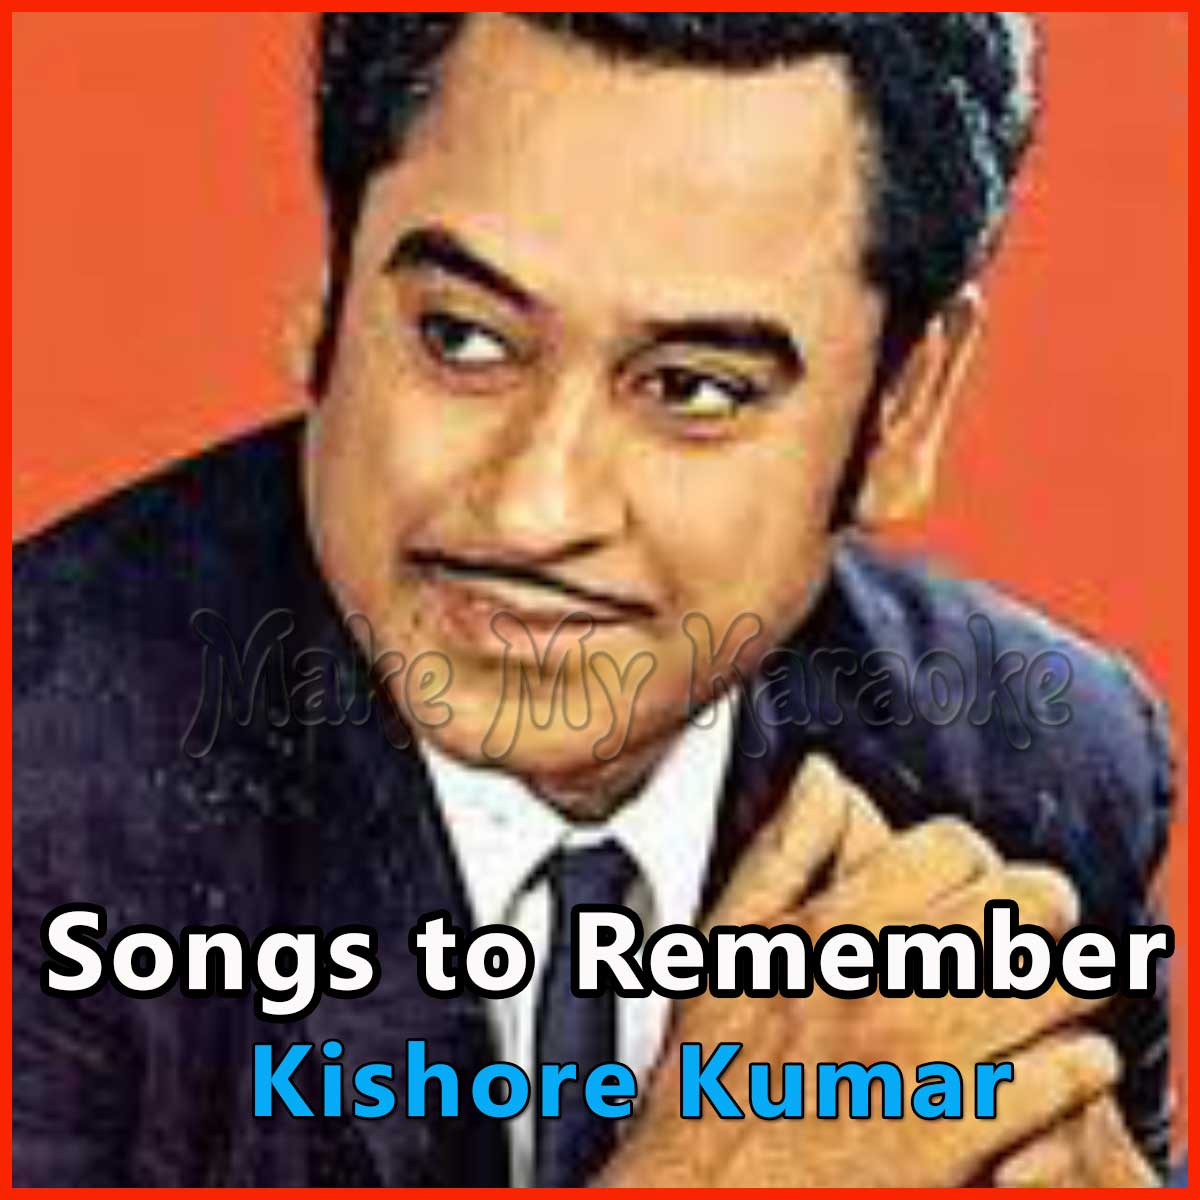 Kishore Kumar lyrics